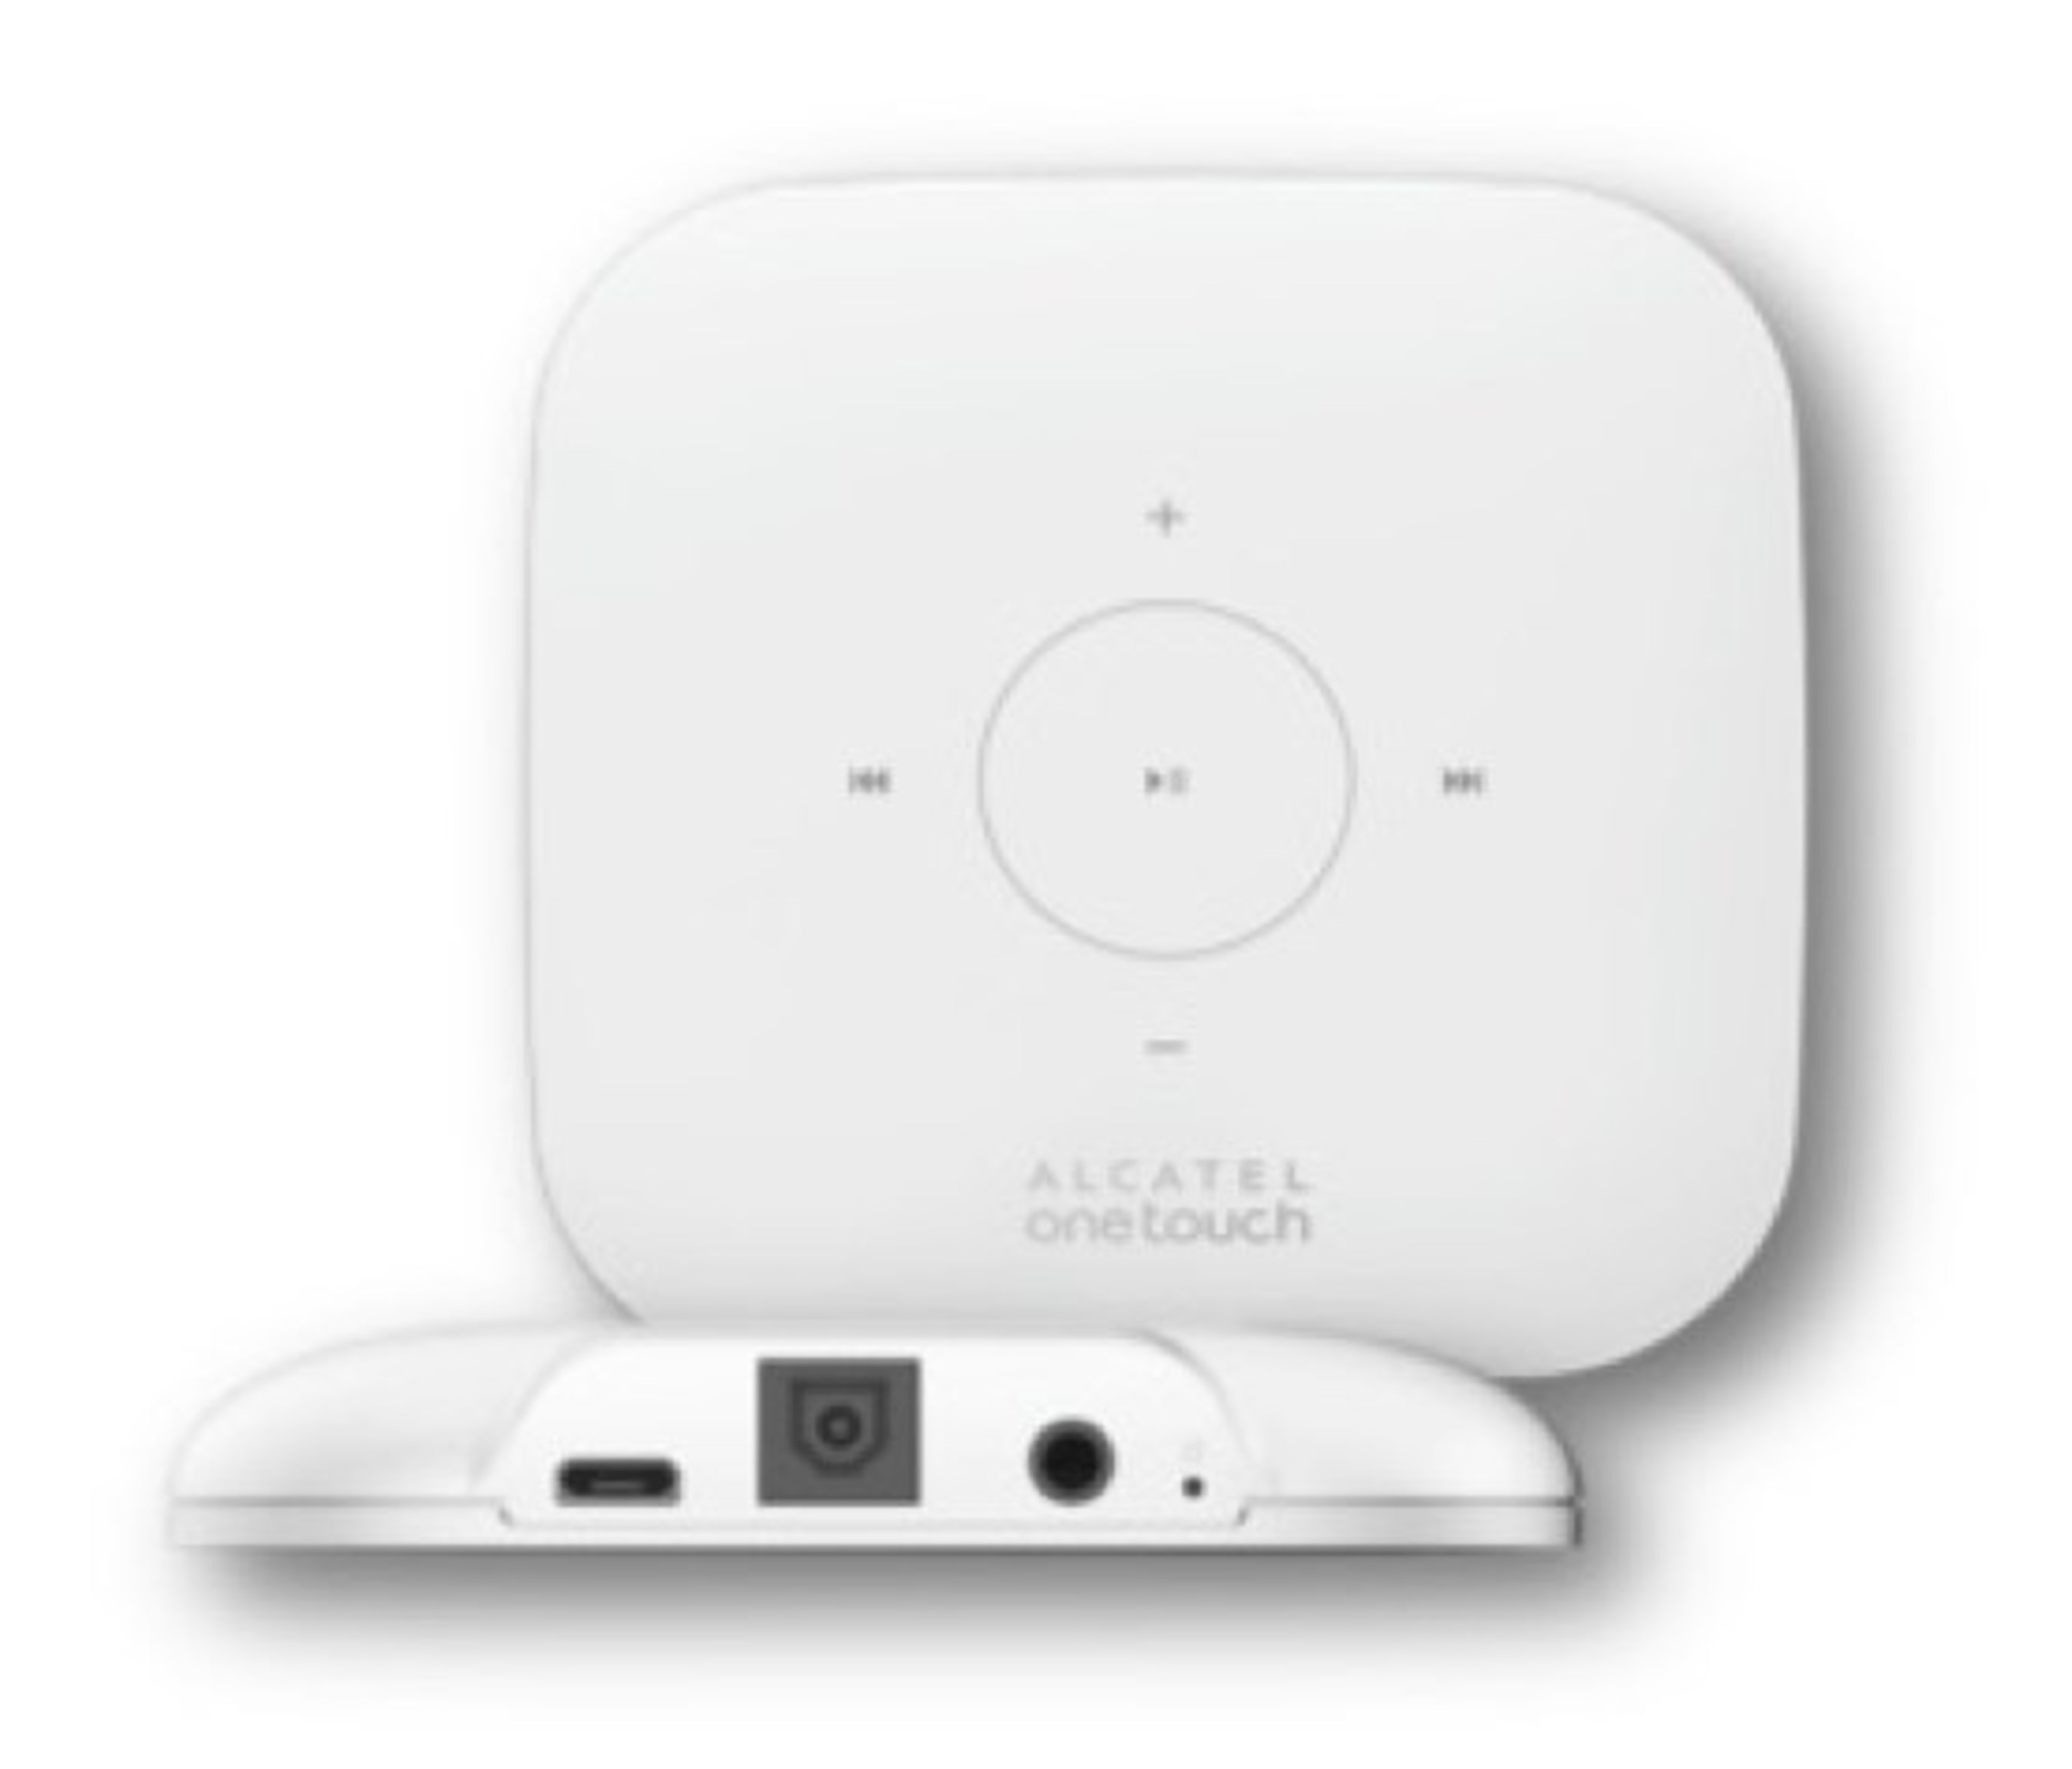 ALCATEL ONETOUCH sigue ampliando su cartera de dispositivos inteligentes conectados